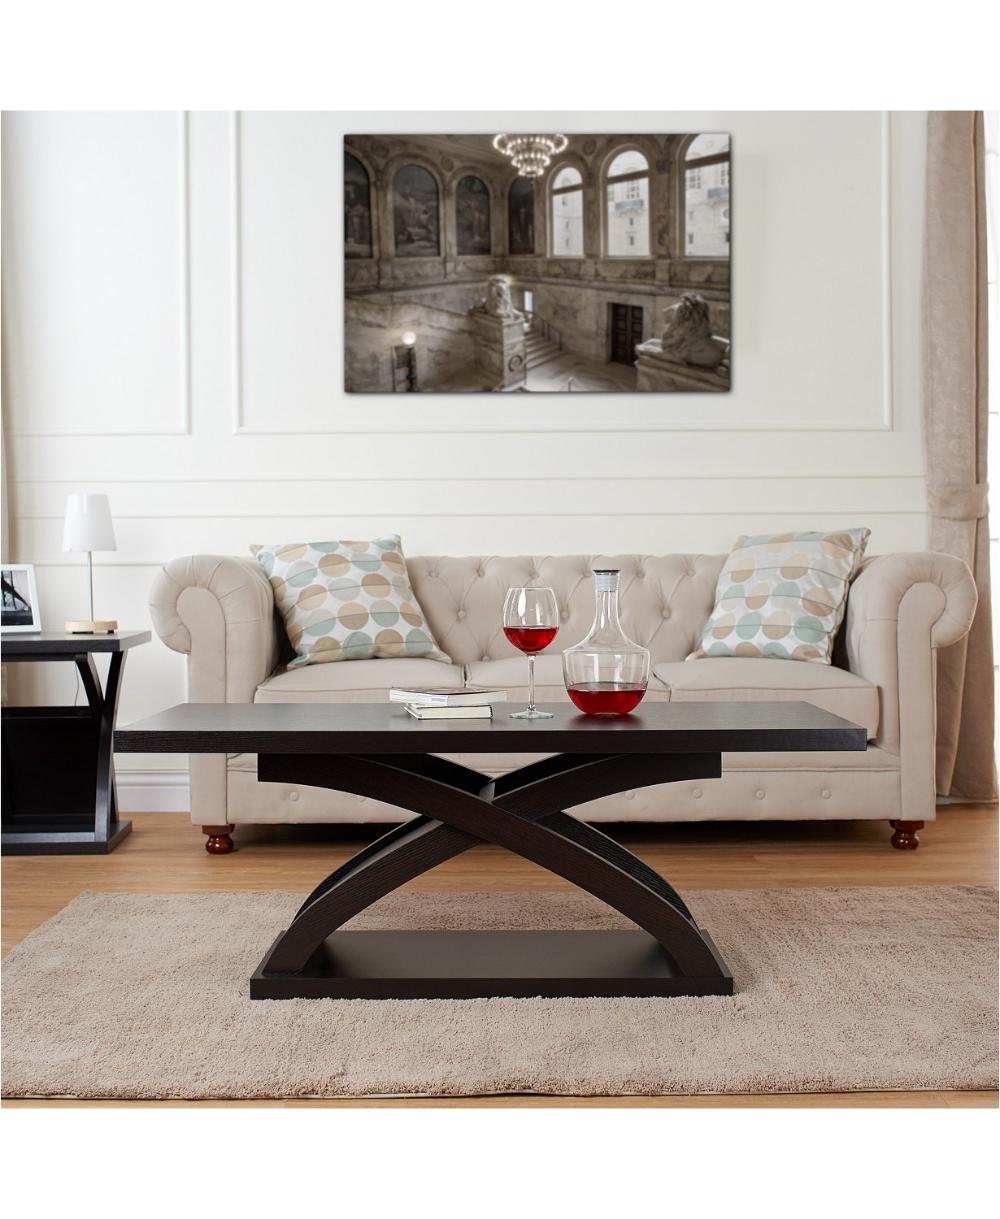 Furniture Of America Porthos X Base Coffee Table Reviews Home Macy S Furniture Of America Furniture Coffee Table [ 1219 x 1000 Pixel ]